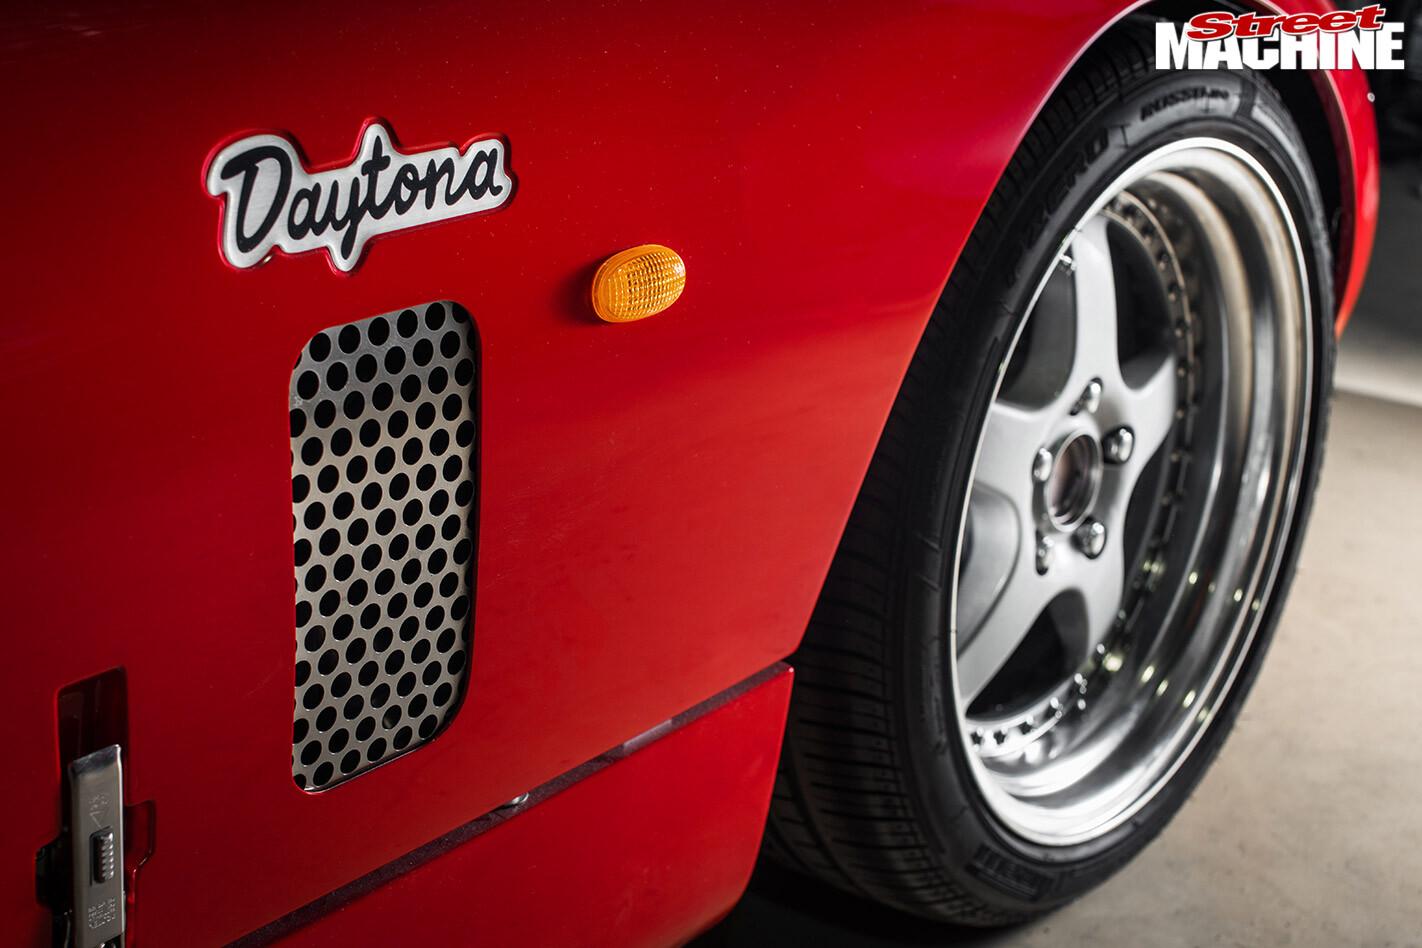 Daytona replica wheel